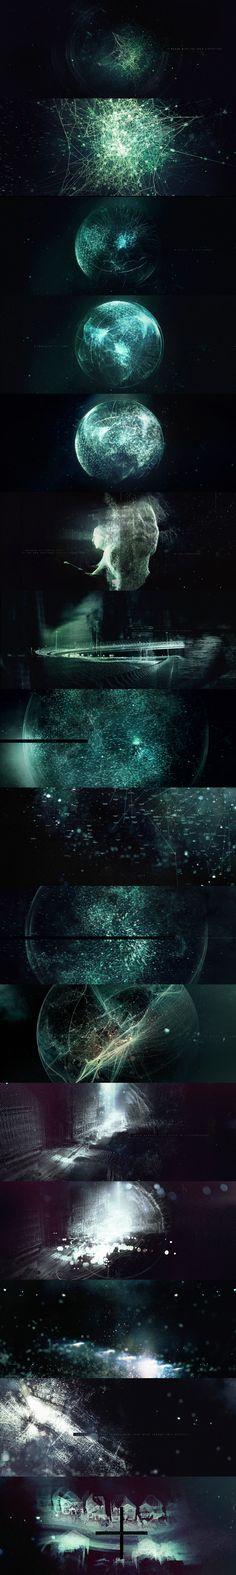 wallpaper-fantasy-science-fiction-hd-52